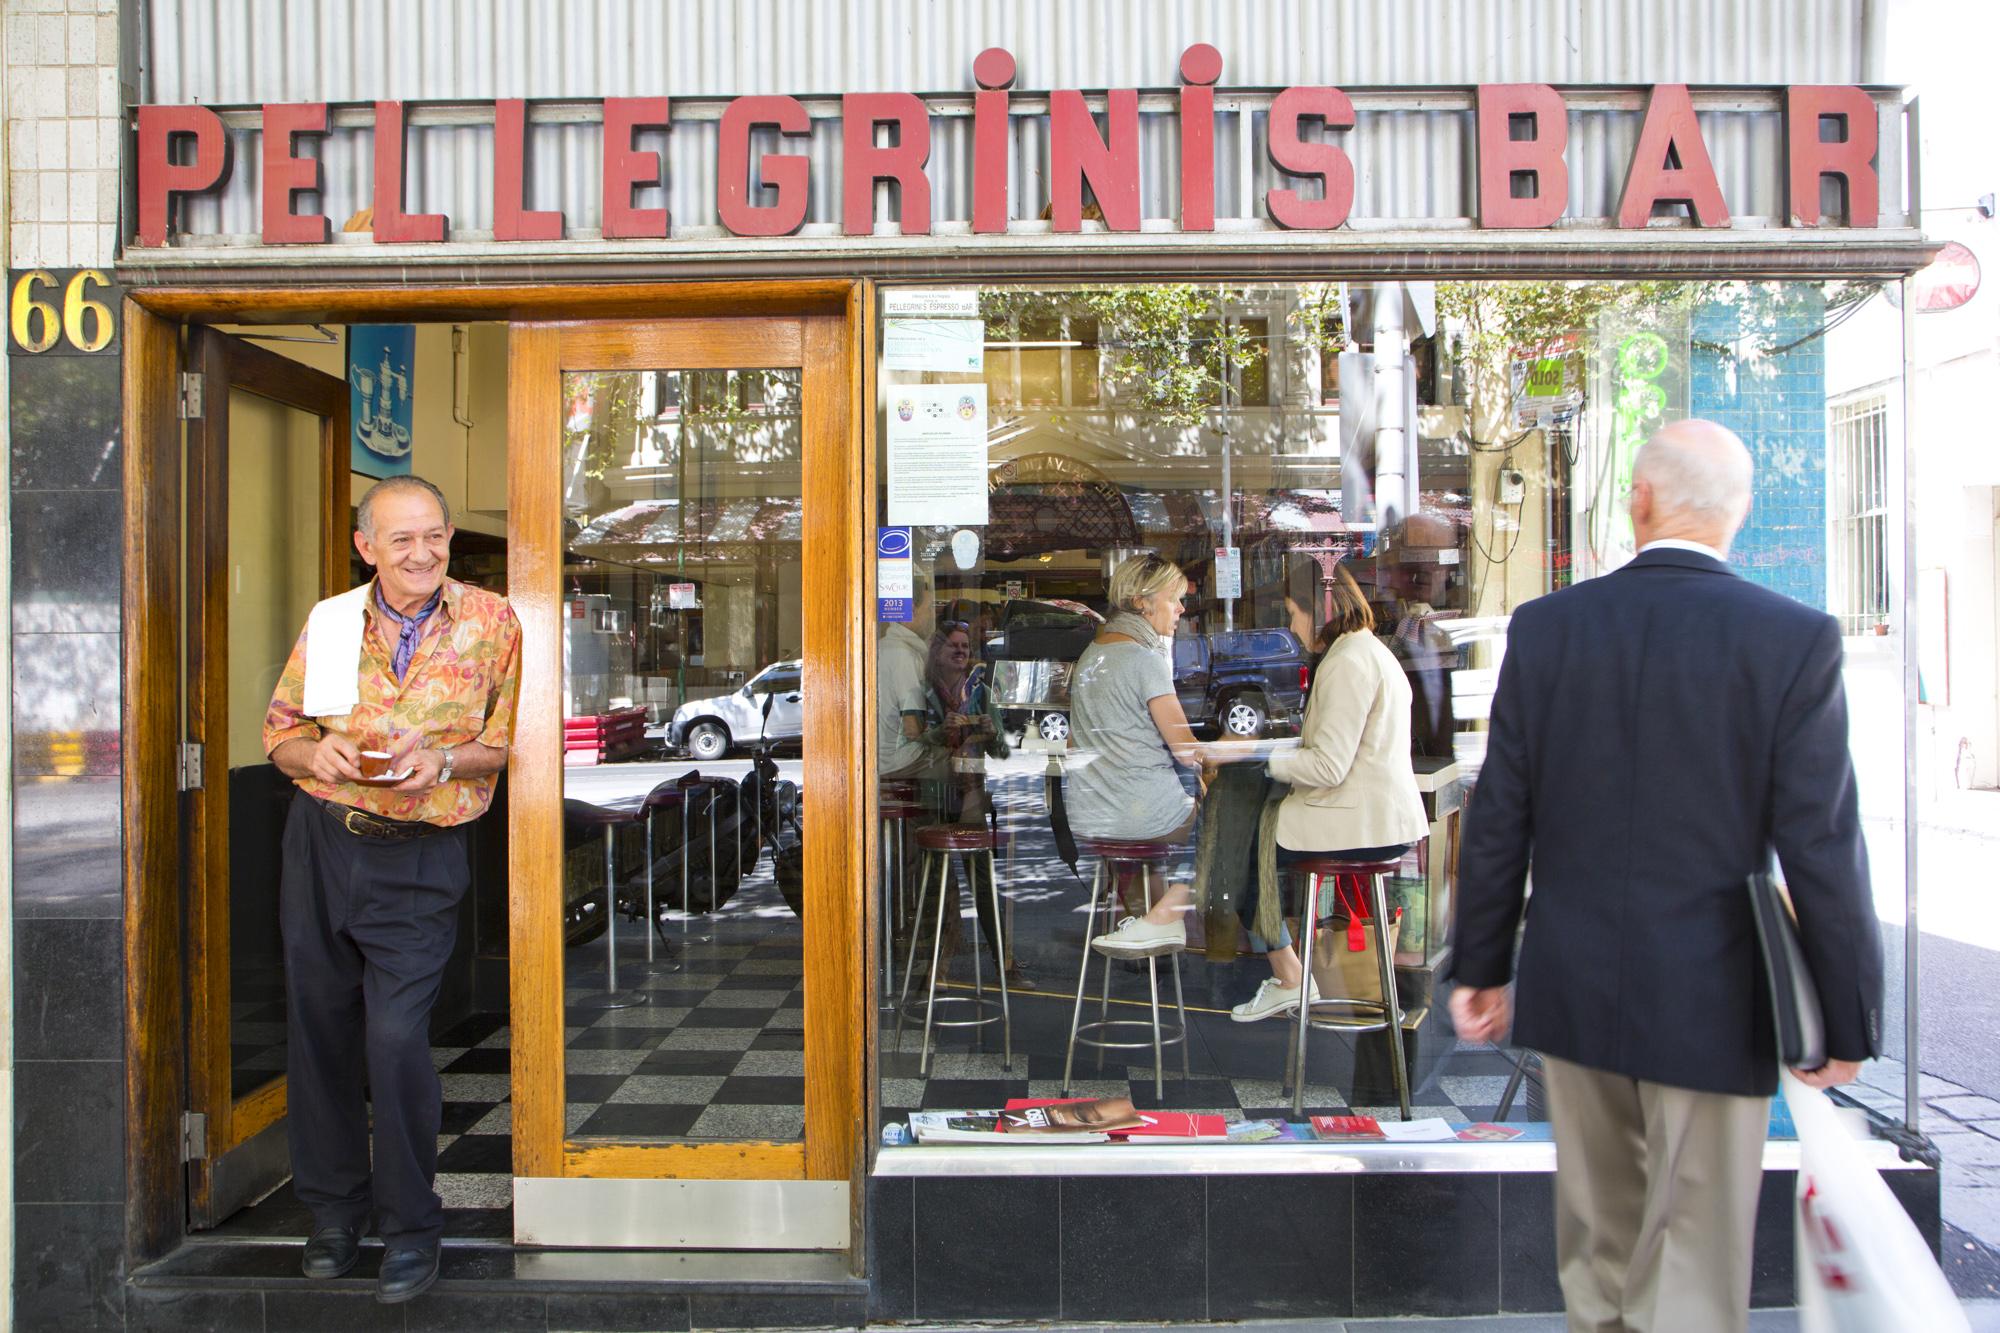 Pelligrinis Expresso, Besitzer Sisto, erste Expresso Bar in Melbourne, Australien